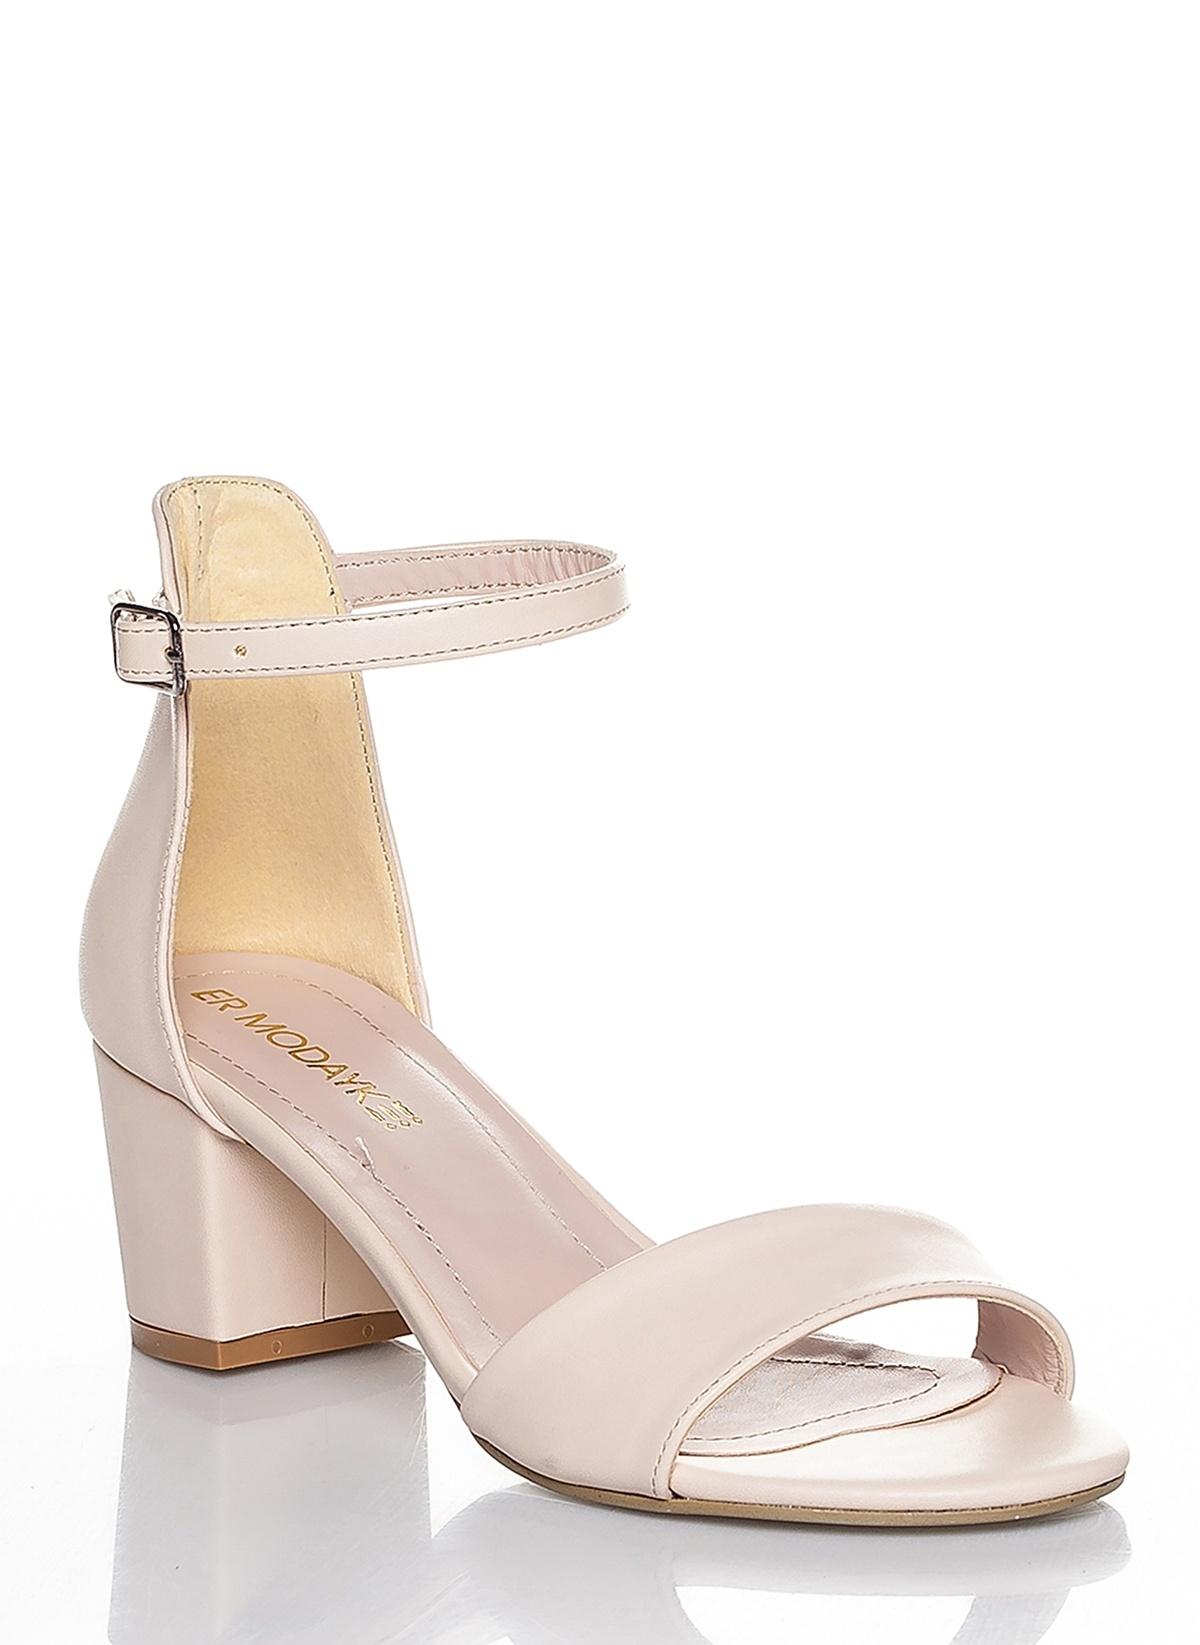 Efem Ayakkabı 19ymd55114 Stiletto – 99.9 TL